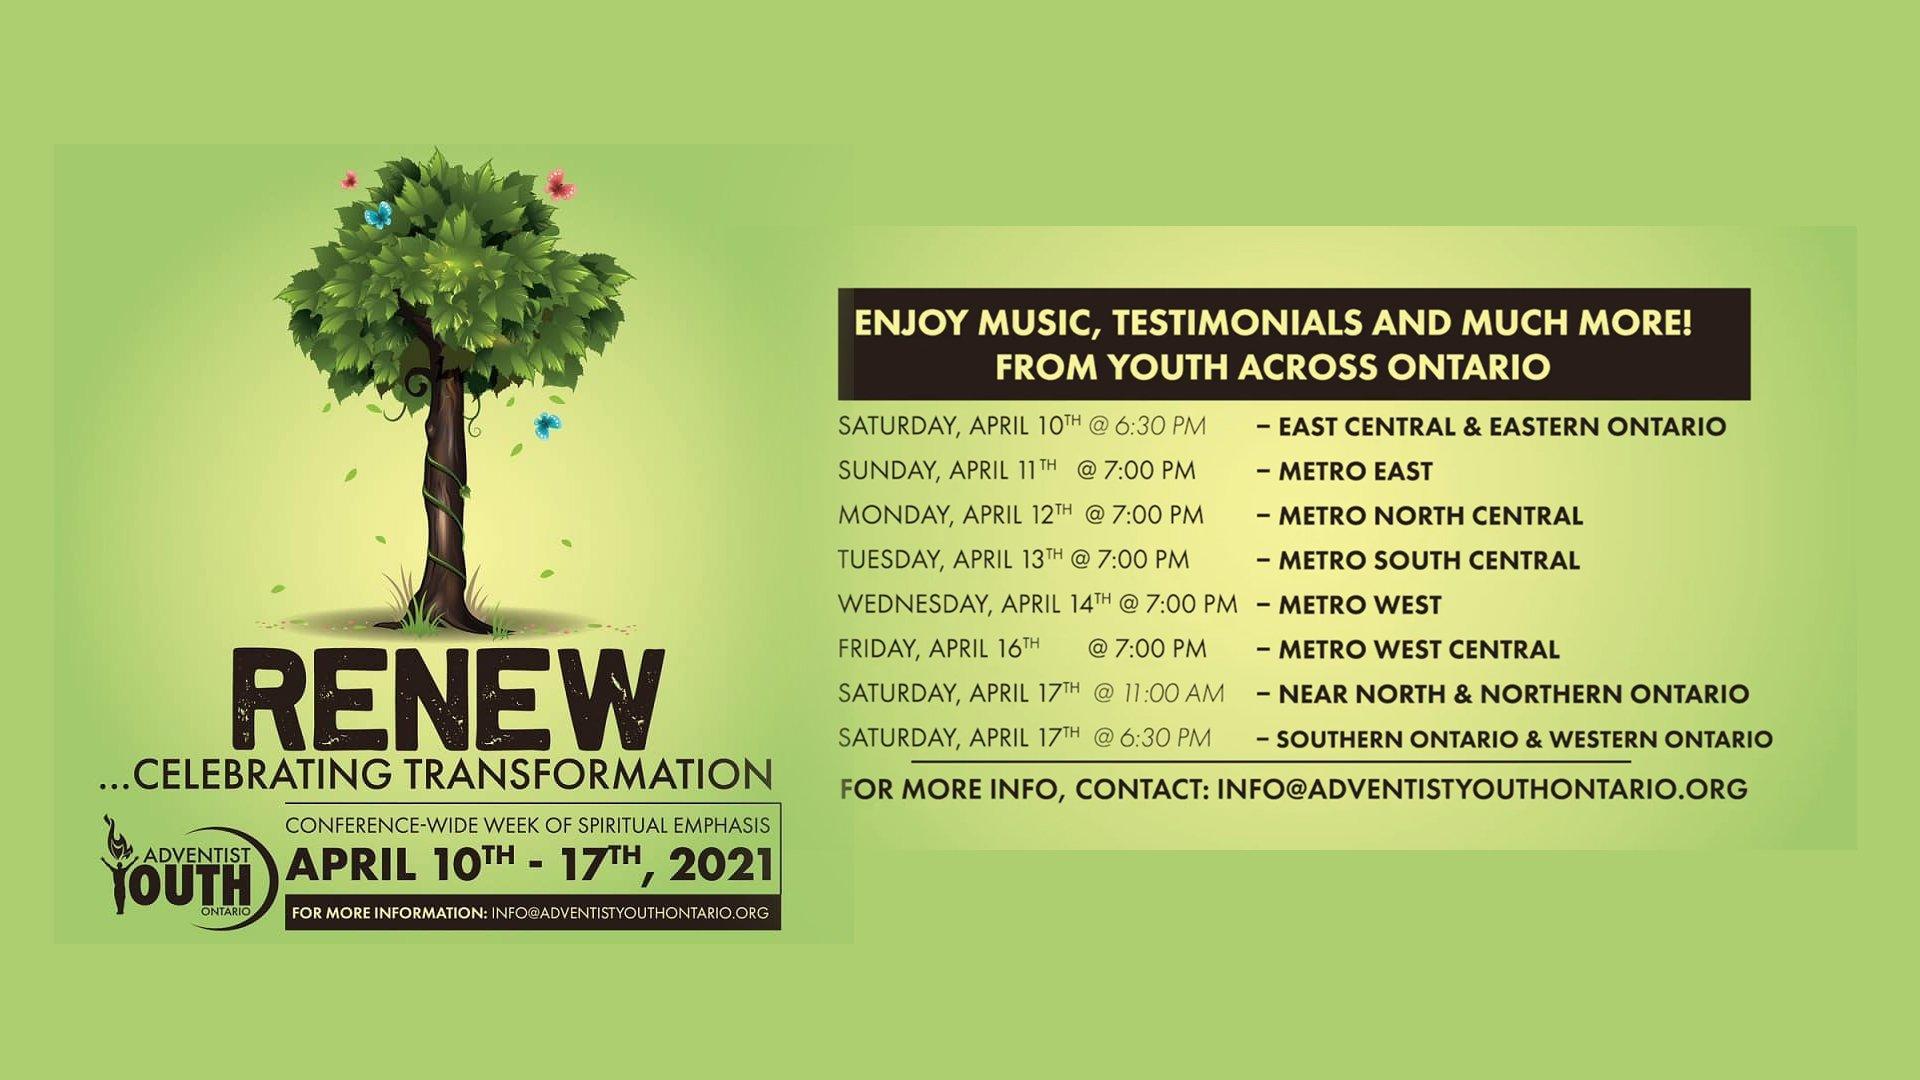 Renew Celebrating Transformation Adventist Youth Ontario